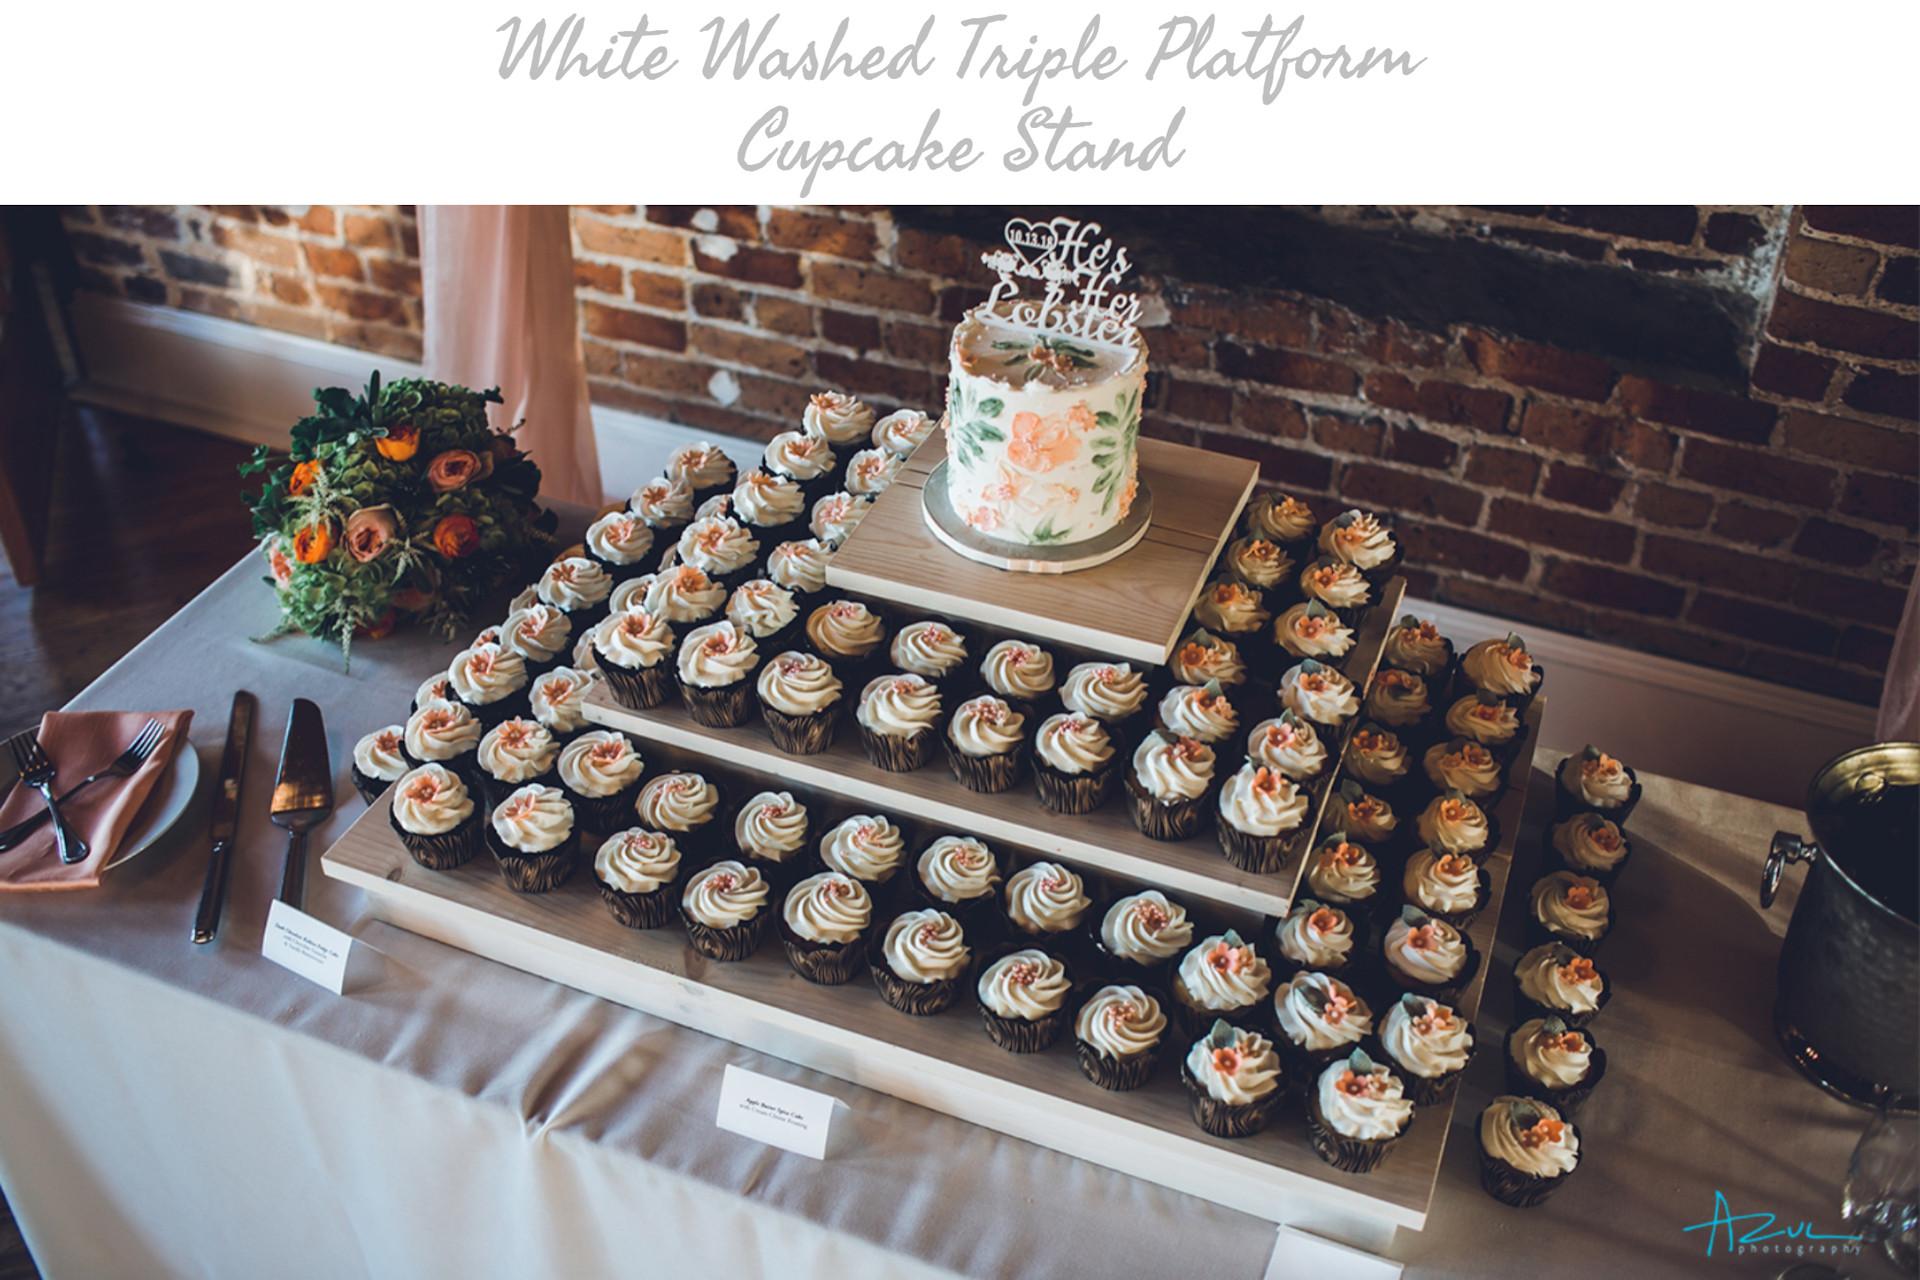 Triple Platform Cupcake Stand